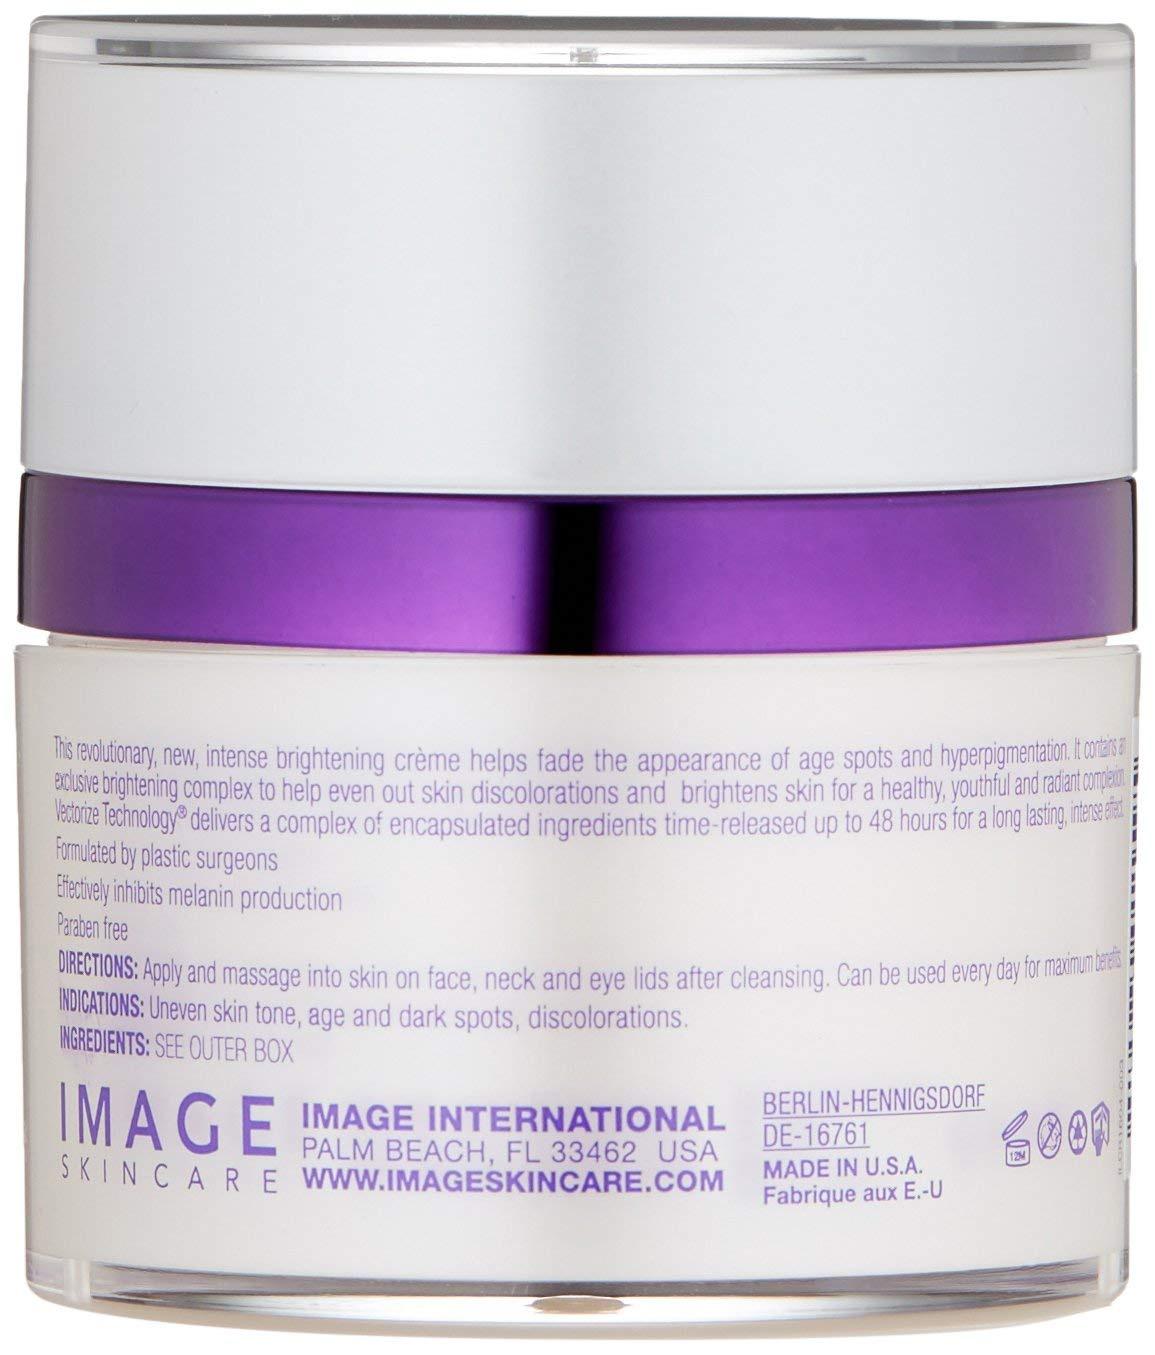 Image Skincare Iluma Intense Brightening Creme By Image Skin Care